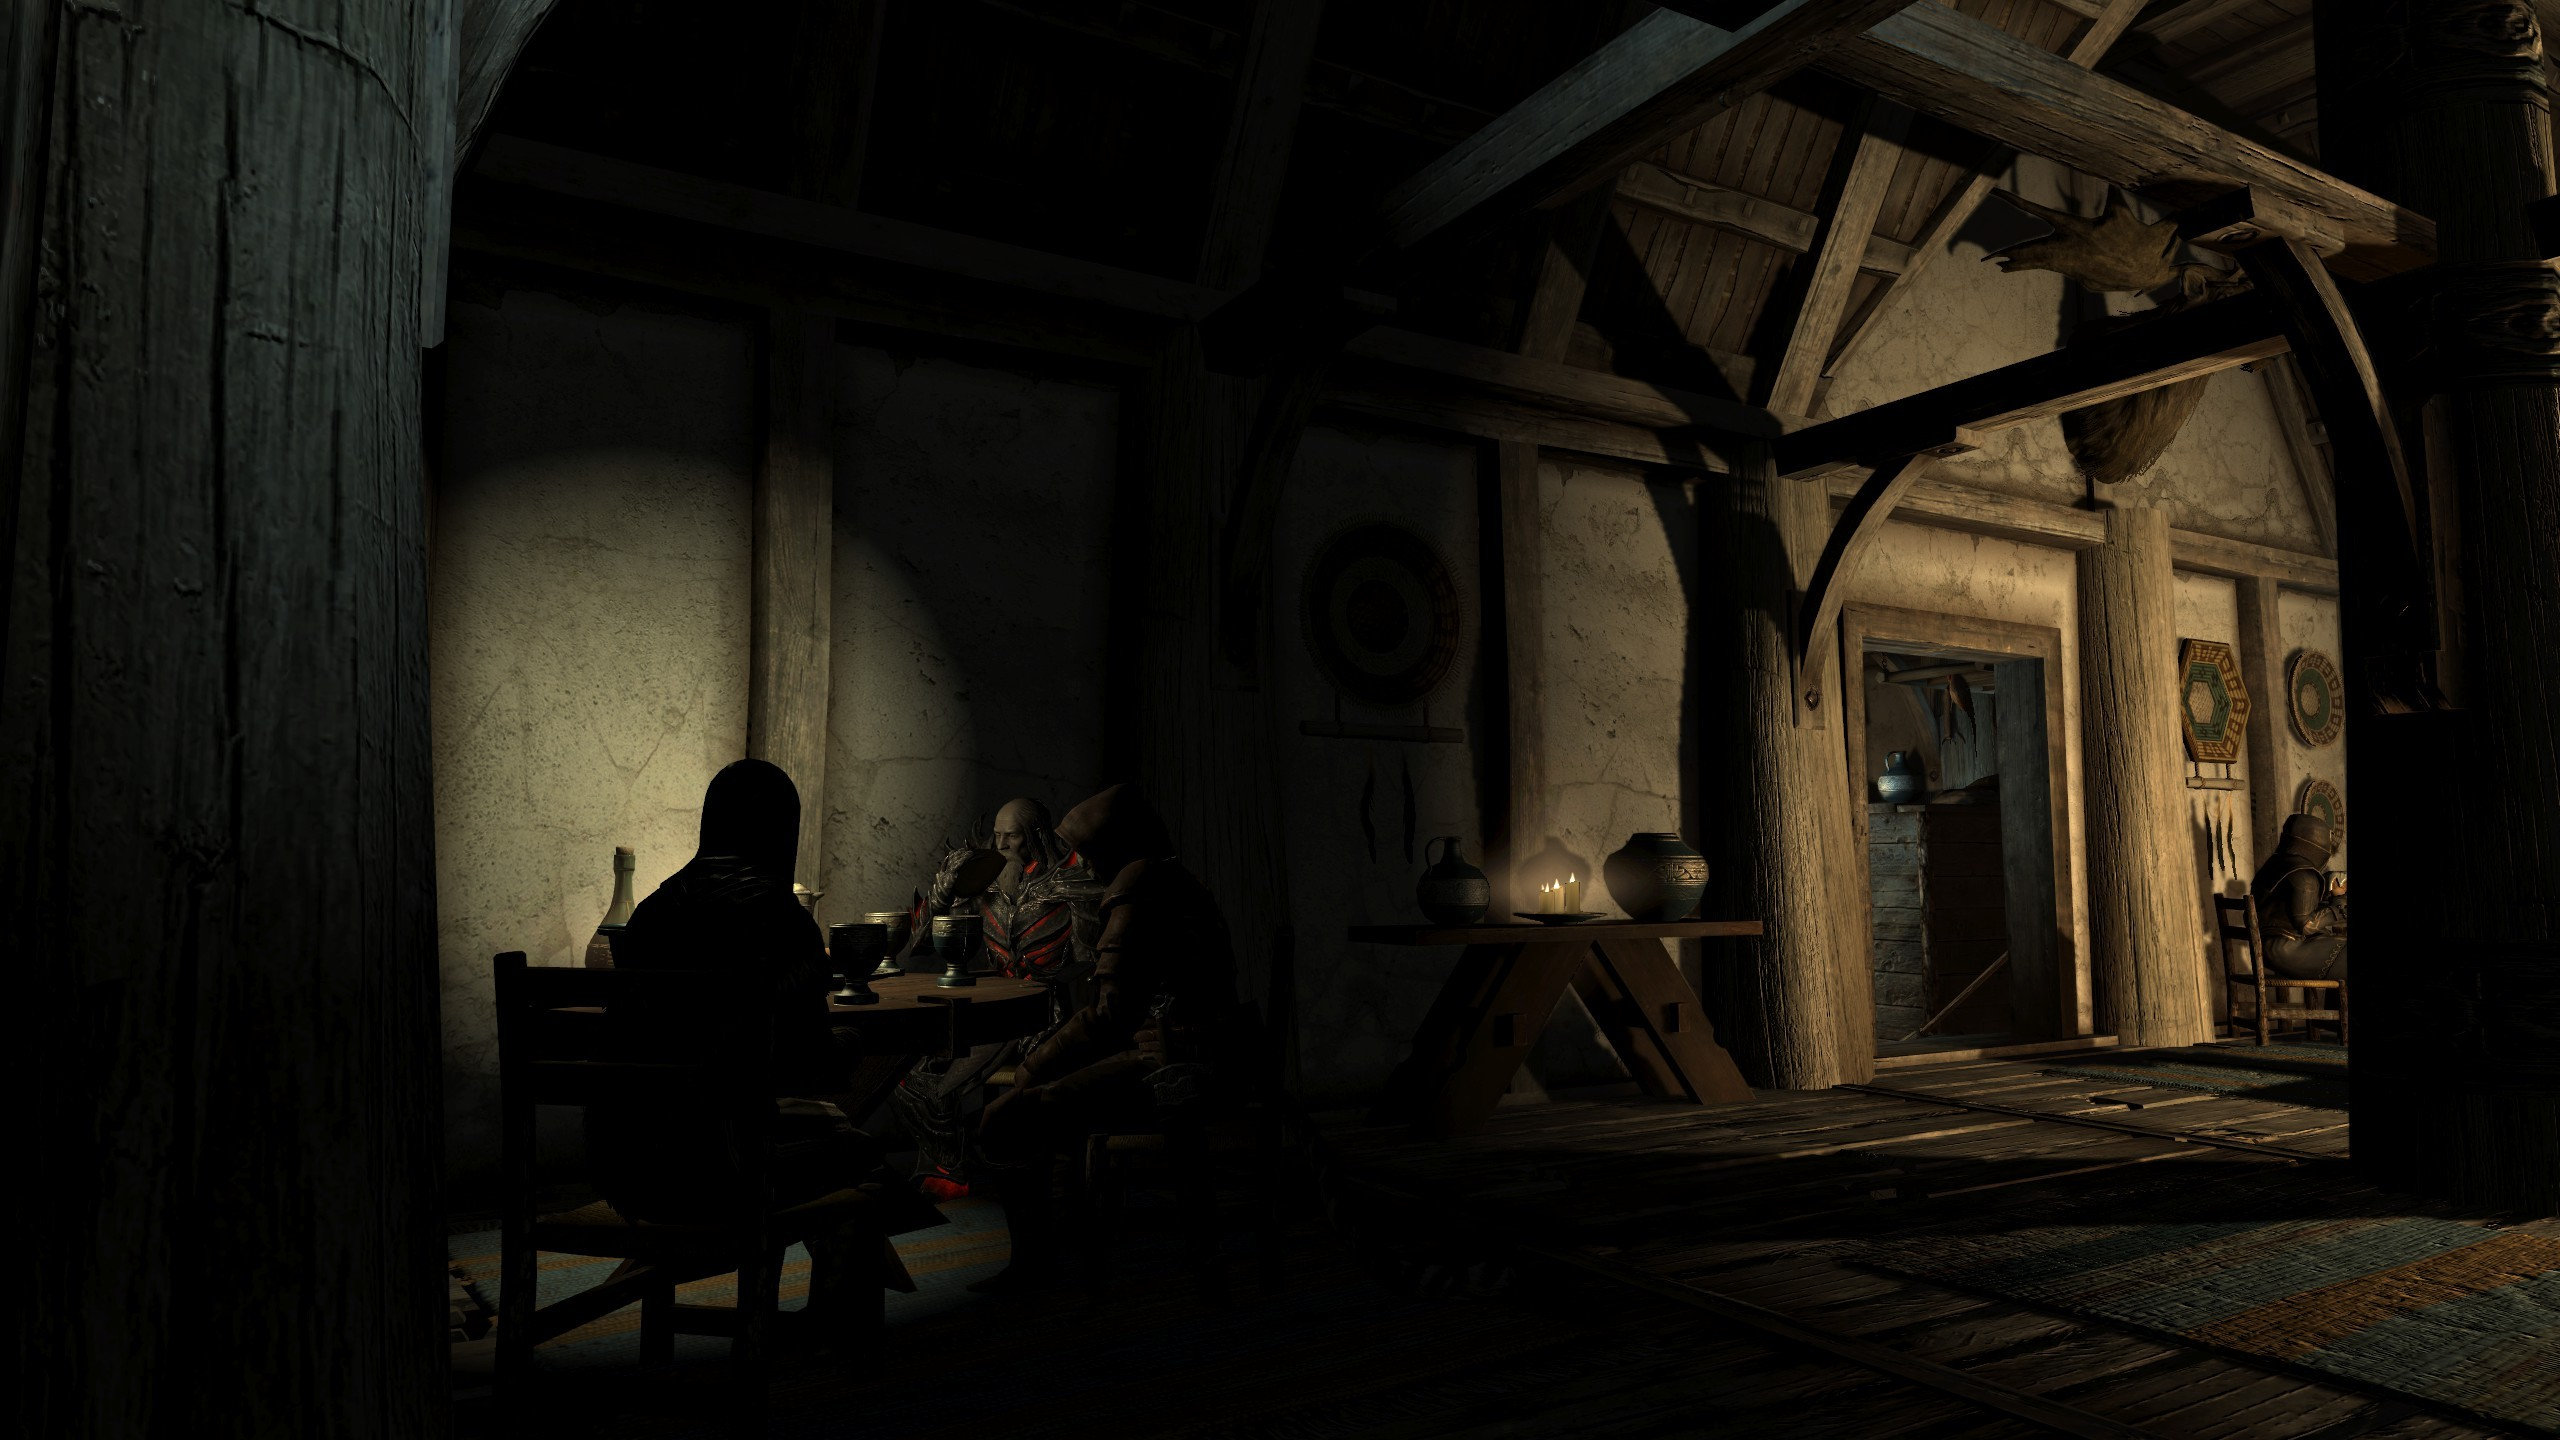 The Elder Scrolls V Skyrim Video Games Wallpaper Resolution 2560x1440 Id 131613 Wallha Com